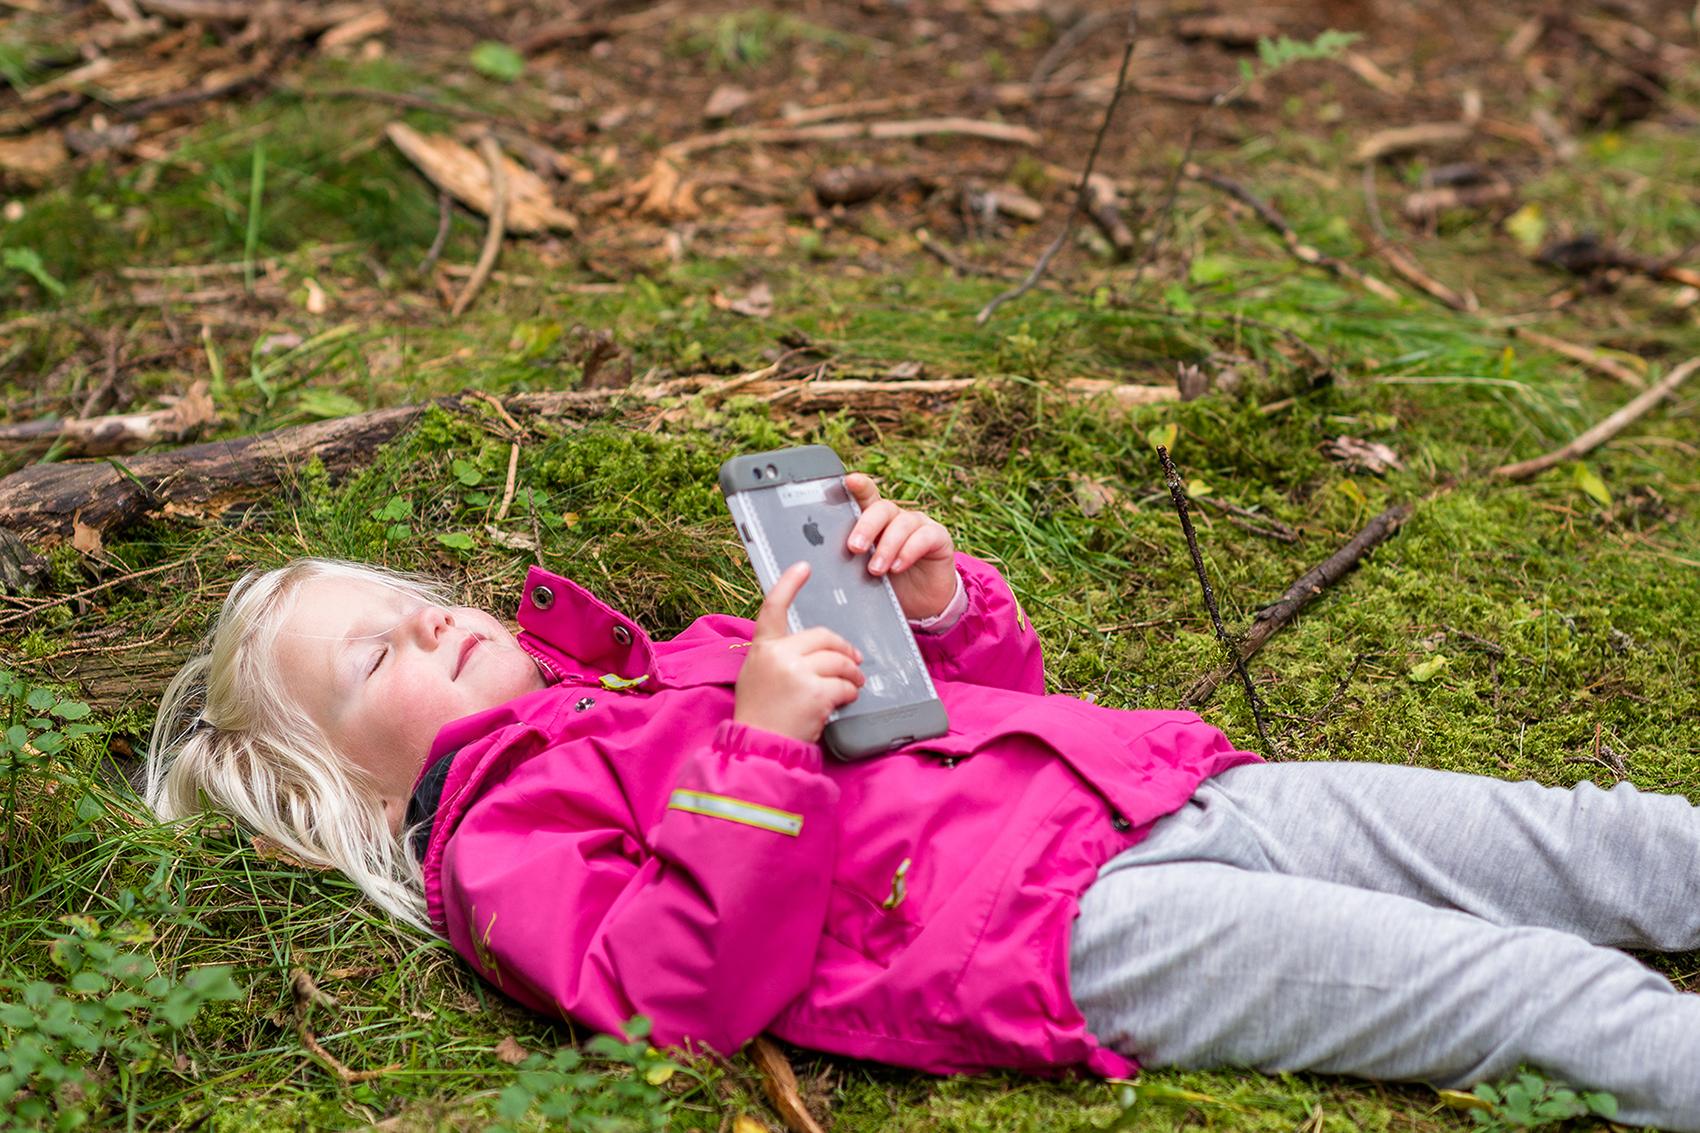 Barnehagebarn som undrer seg med mobiltelefon